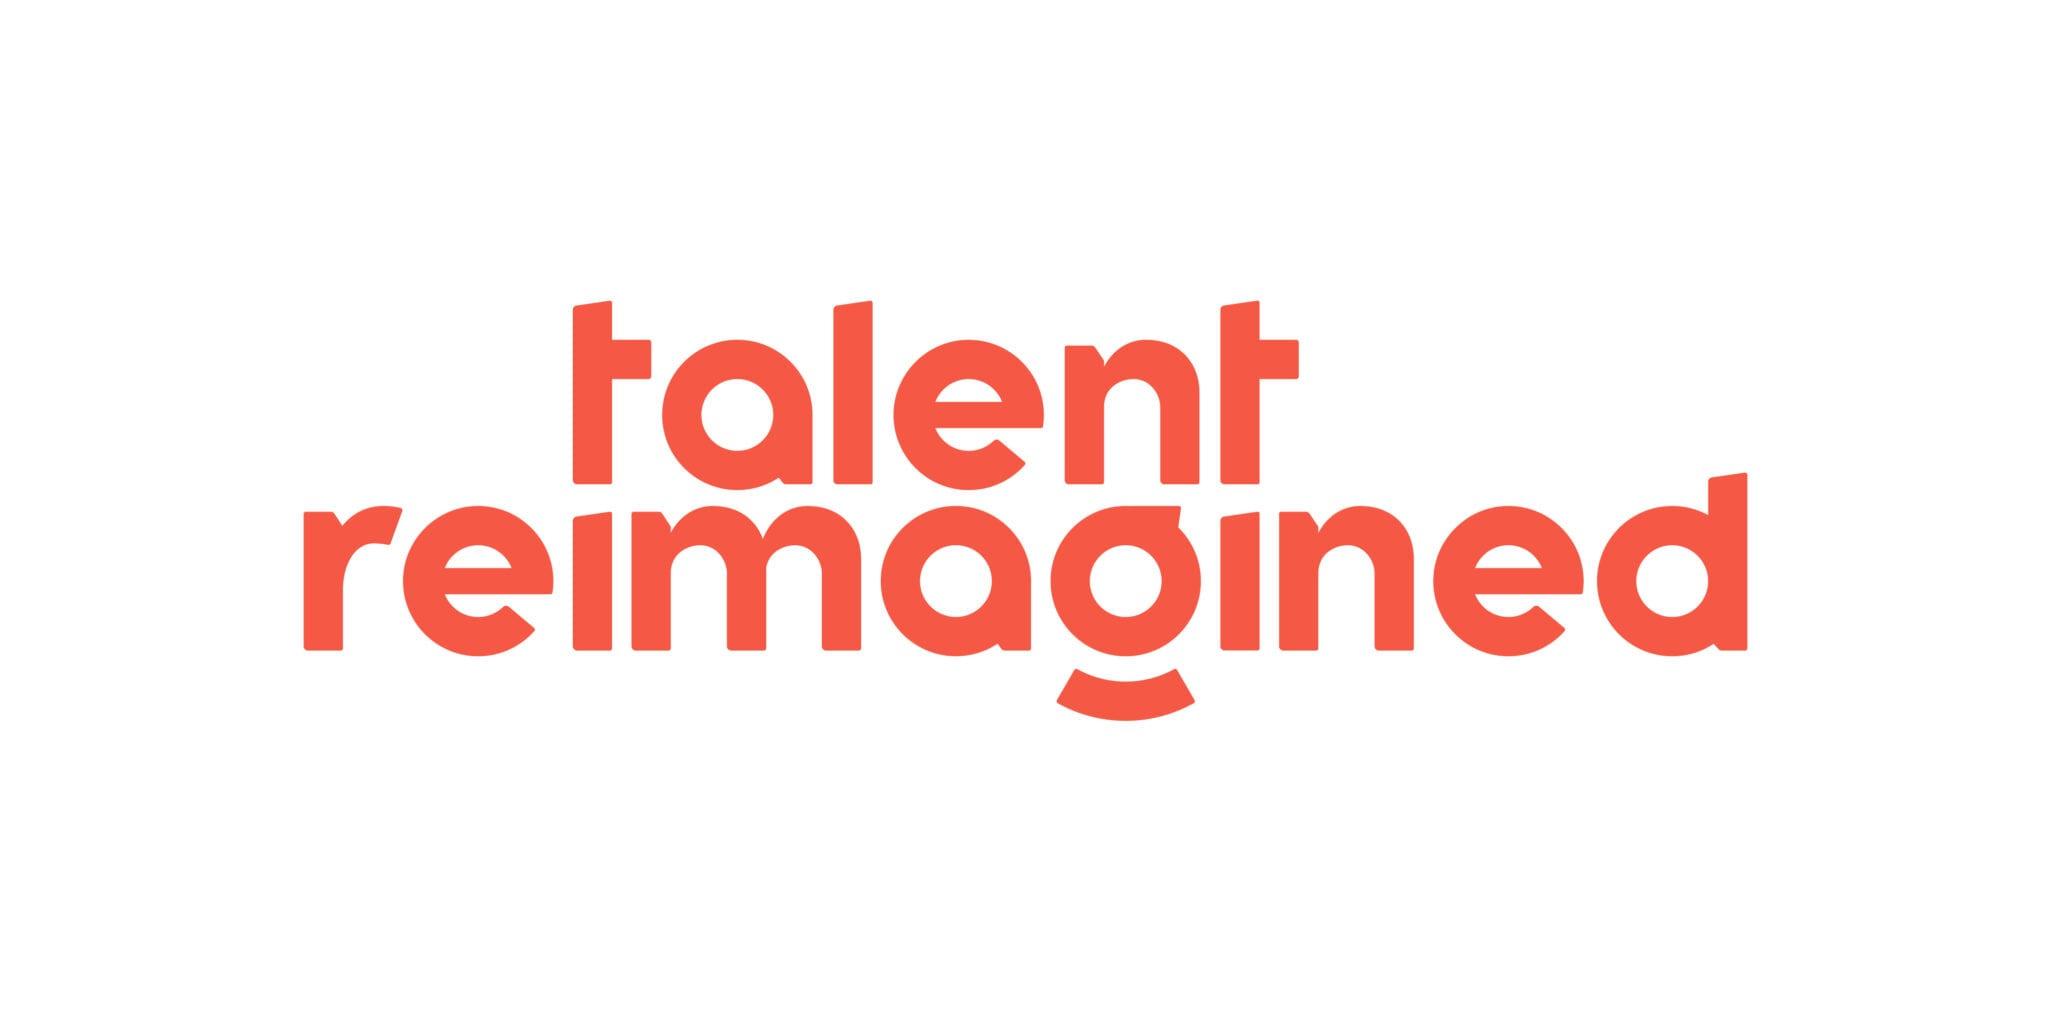 2020-03-24 - Talent Reimagined - Logo - v1 - Blazing Orange - AS